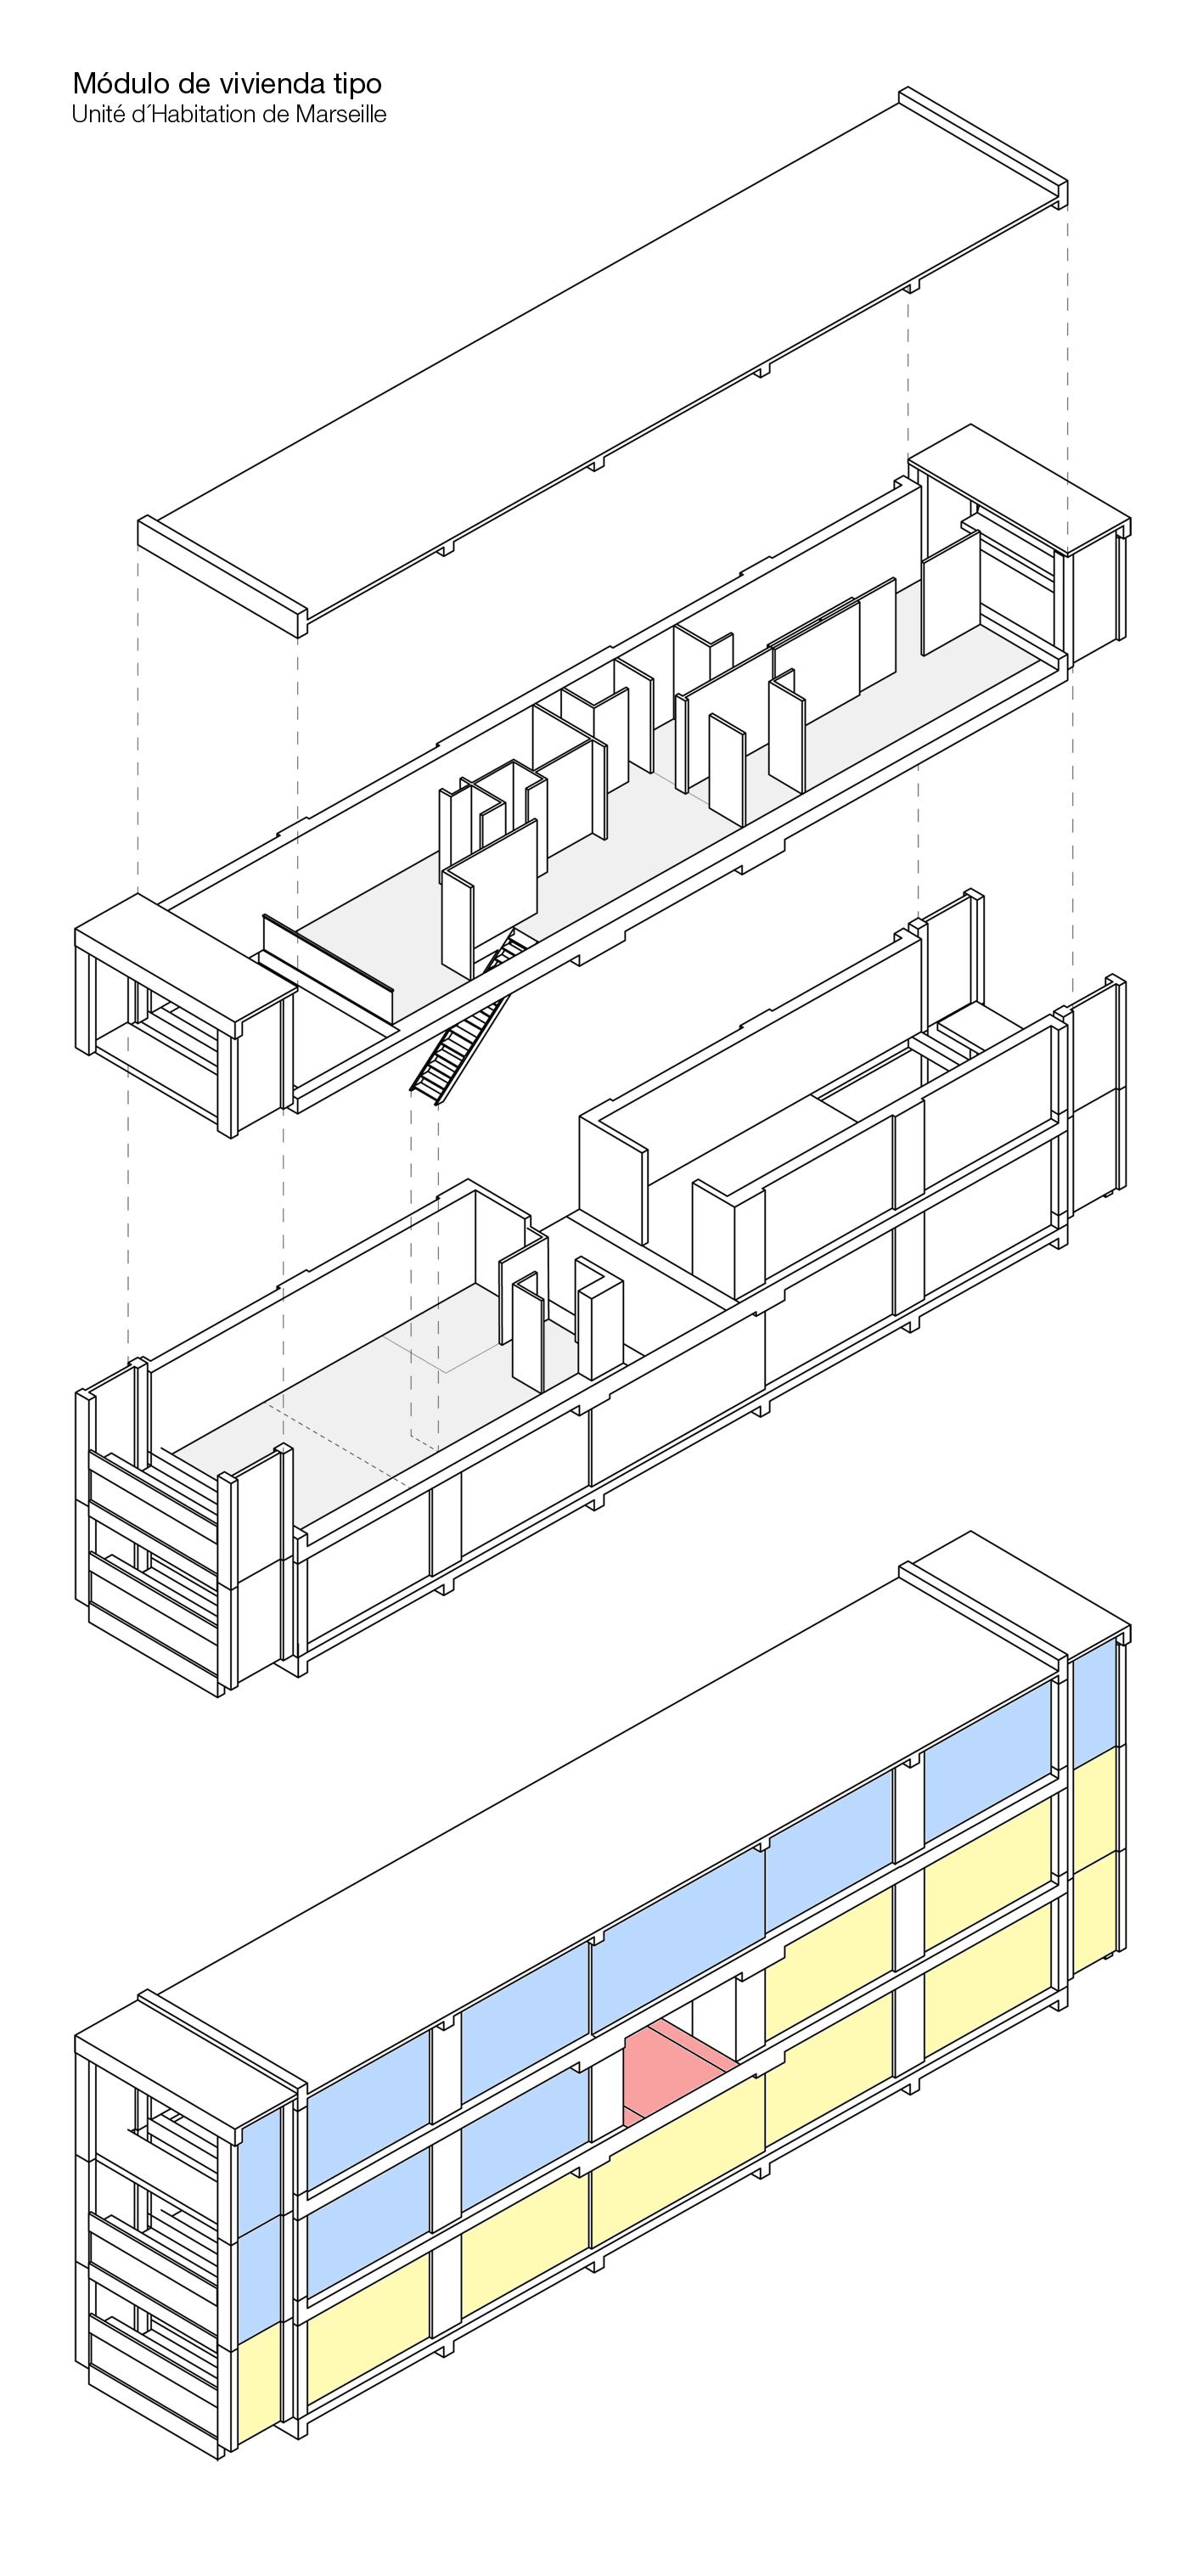 Archivo:Módulo de vivienda tipo de Unité d´Habitation.jpg ...